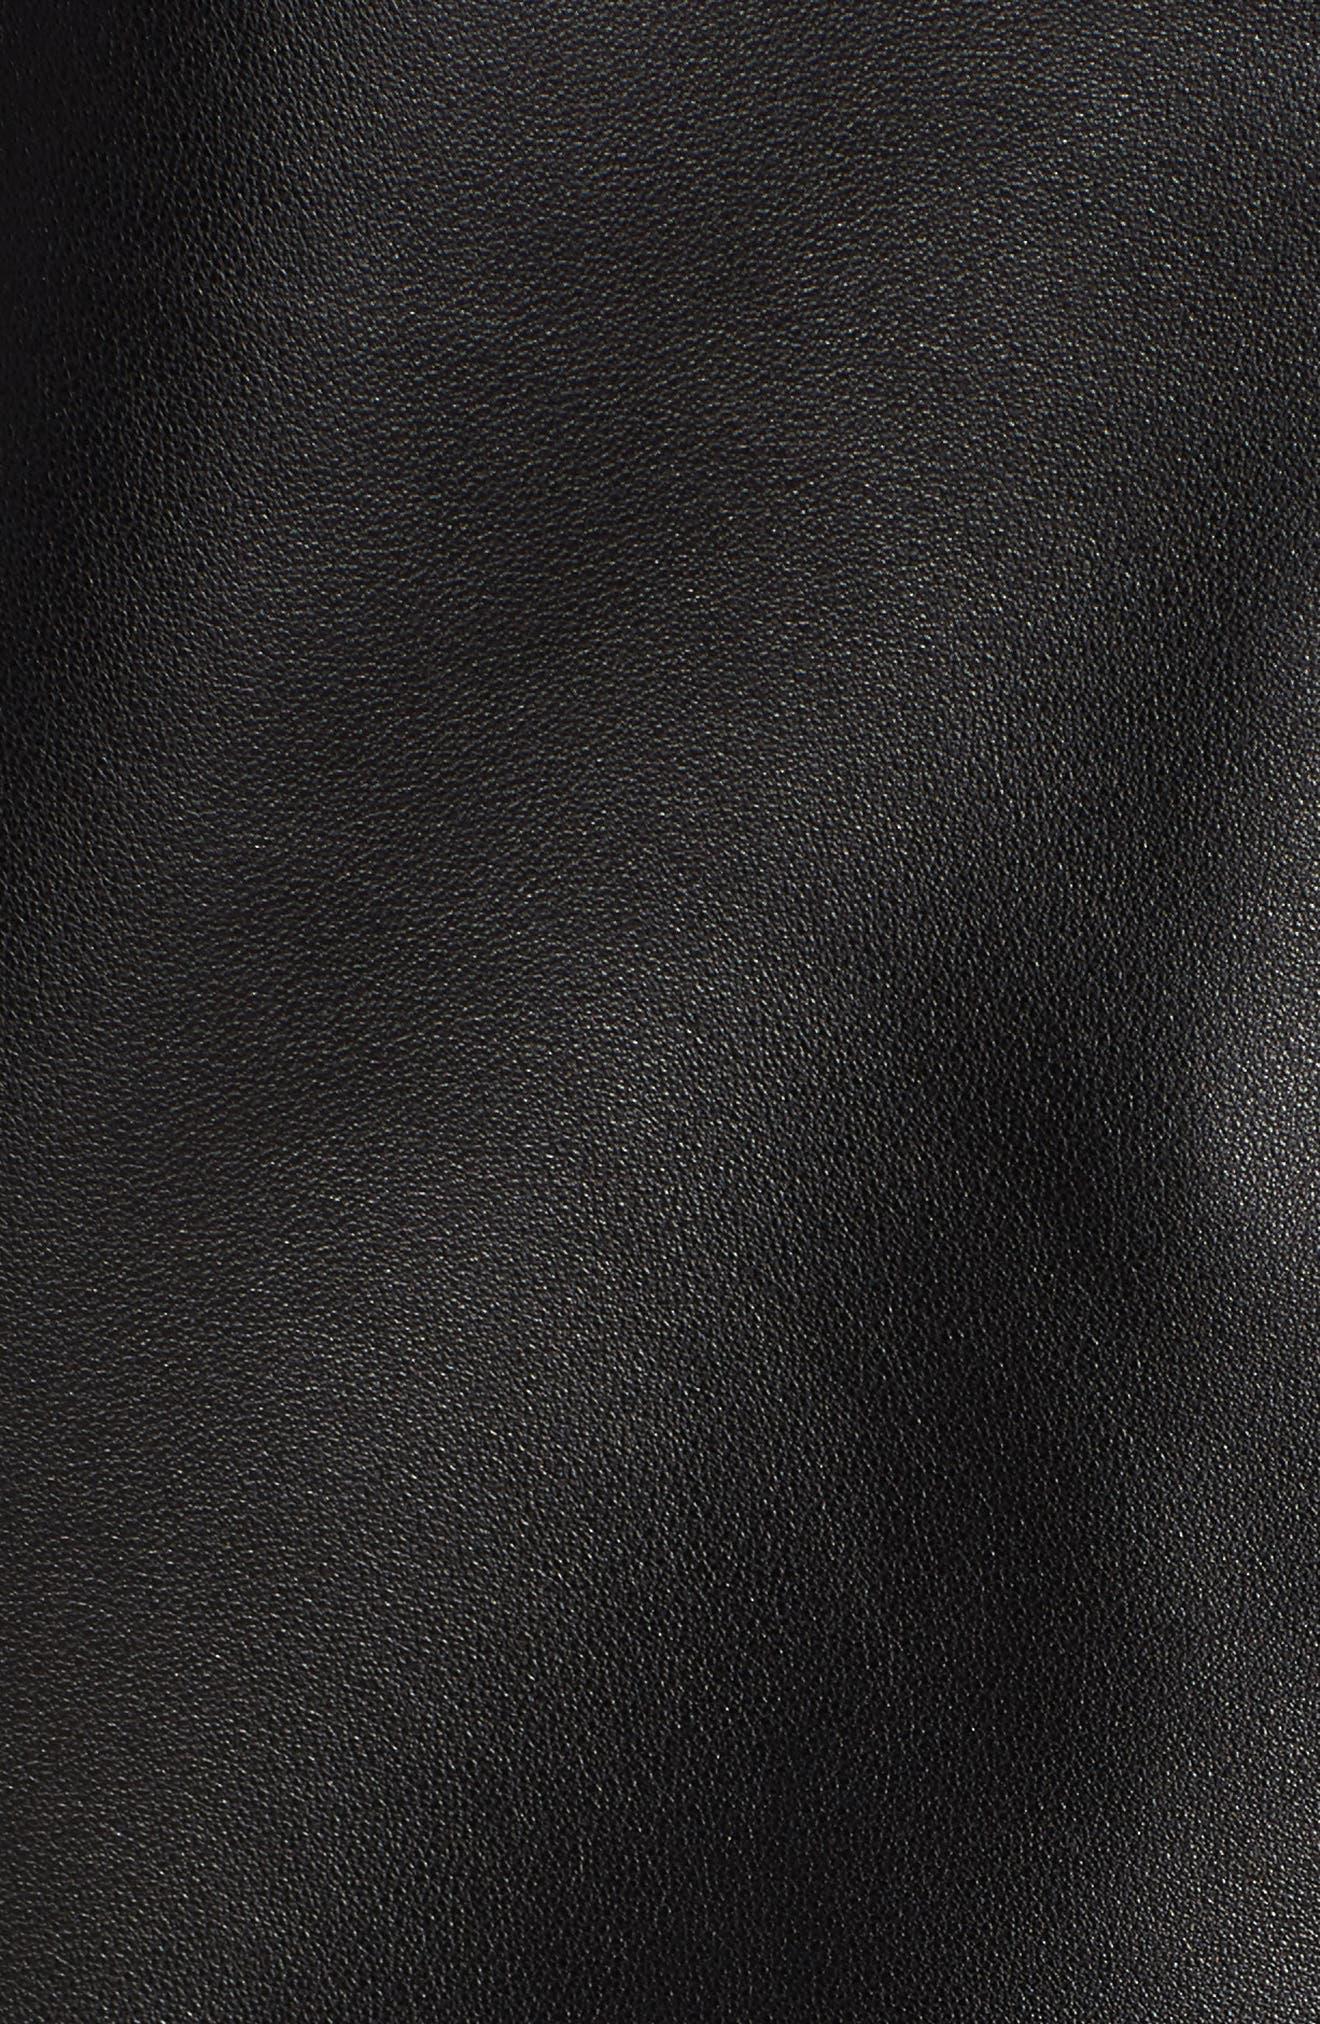 MACKAGE, Fenton Leather Moto Jacket, Alternate thumbnail 6, color, BLACK